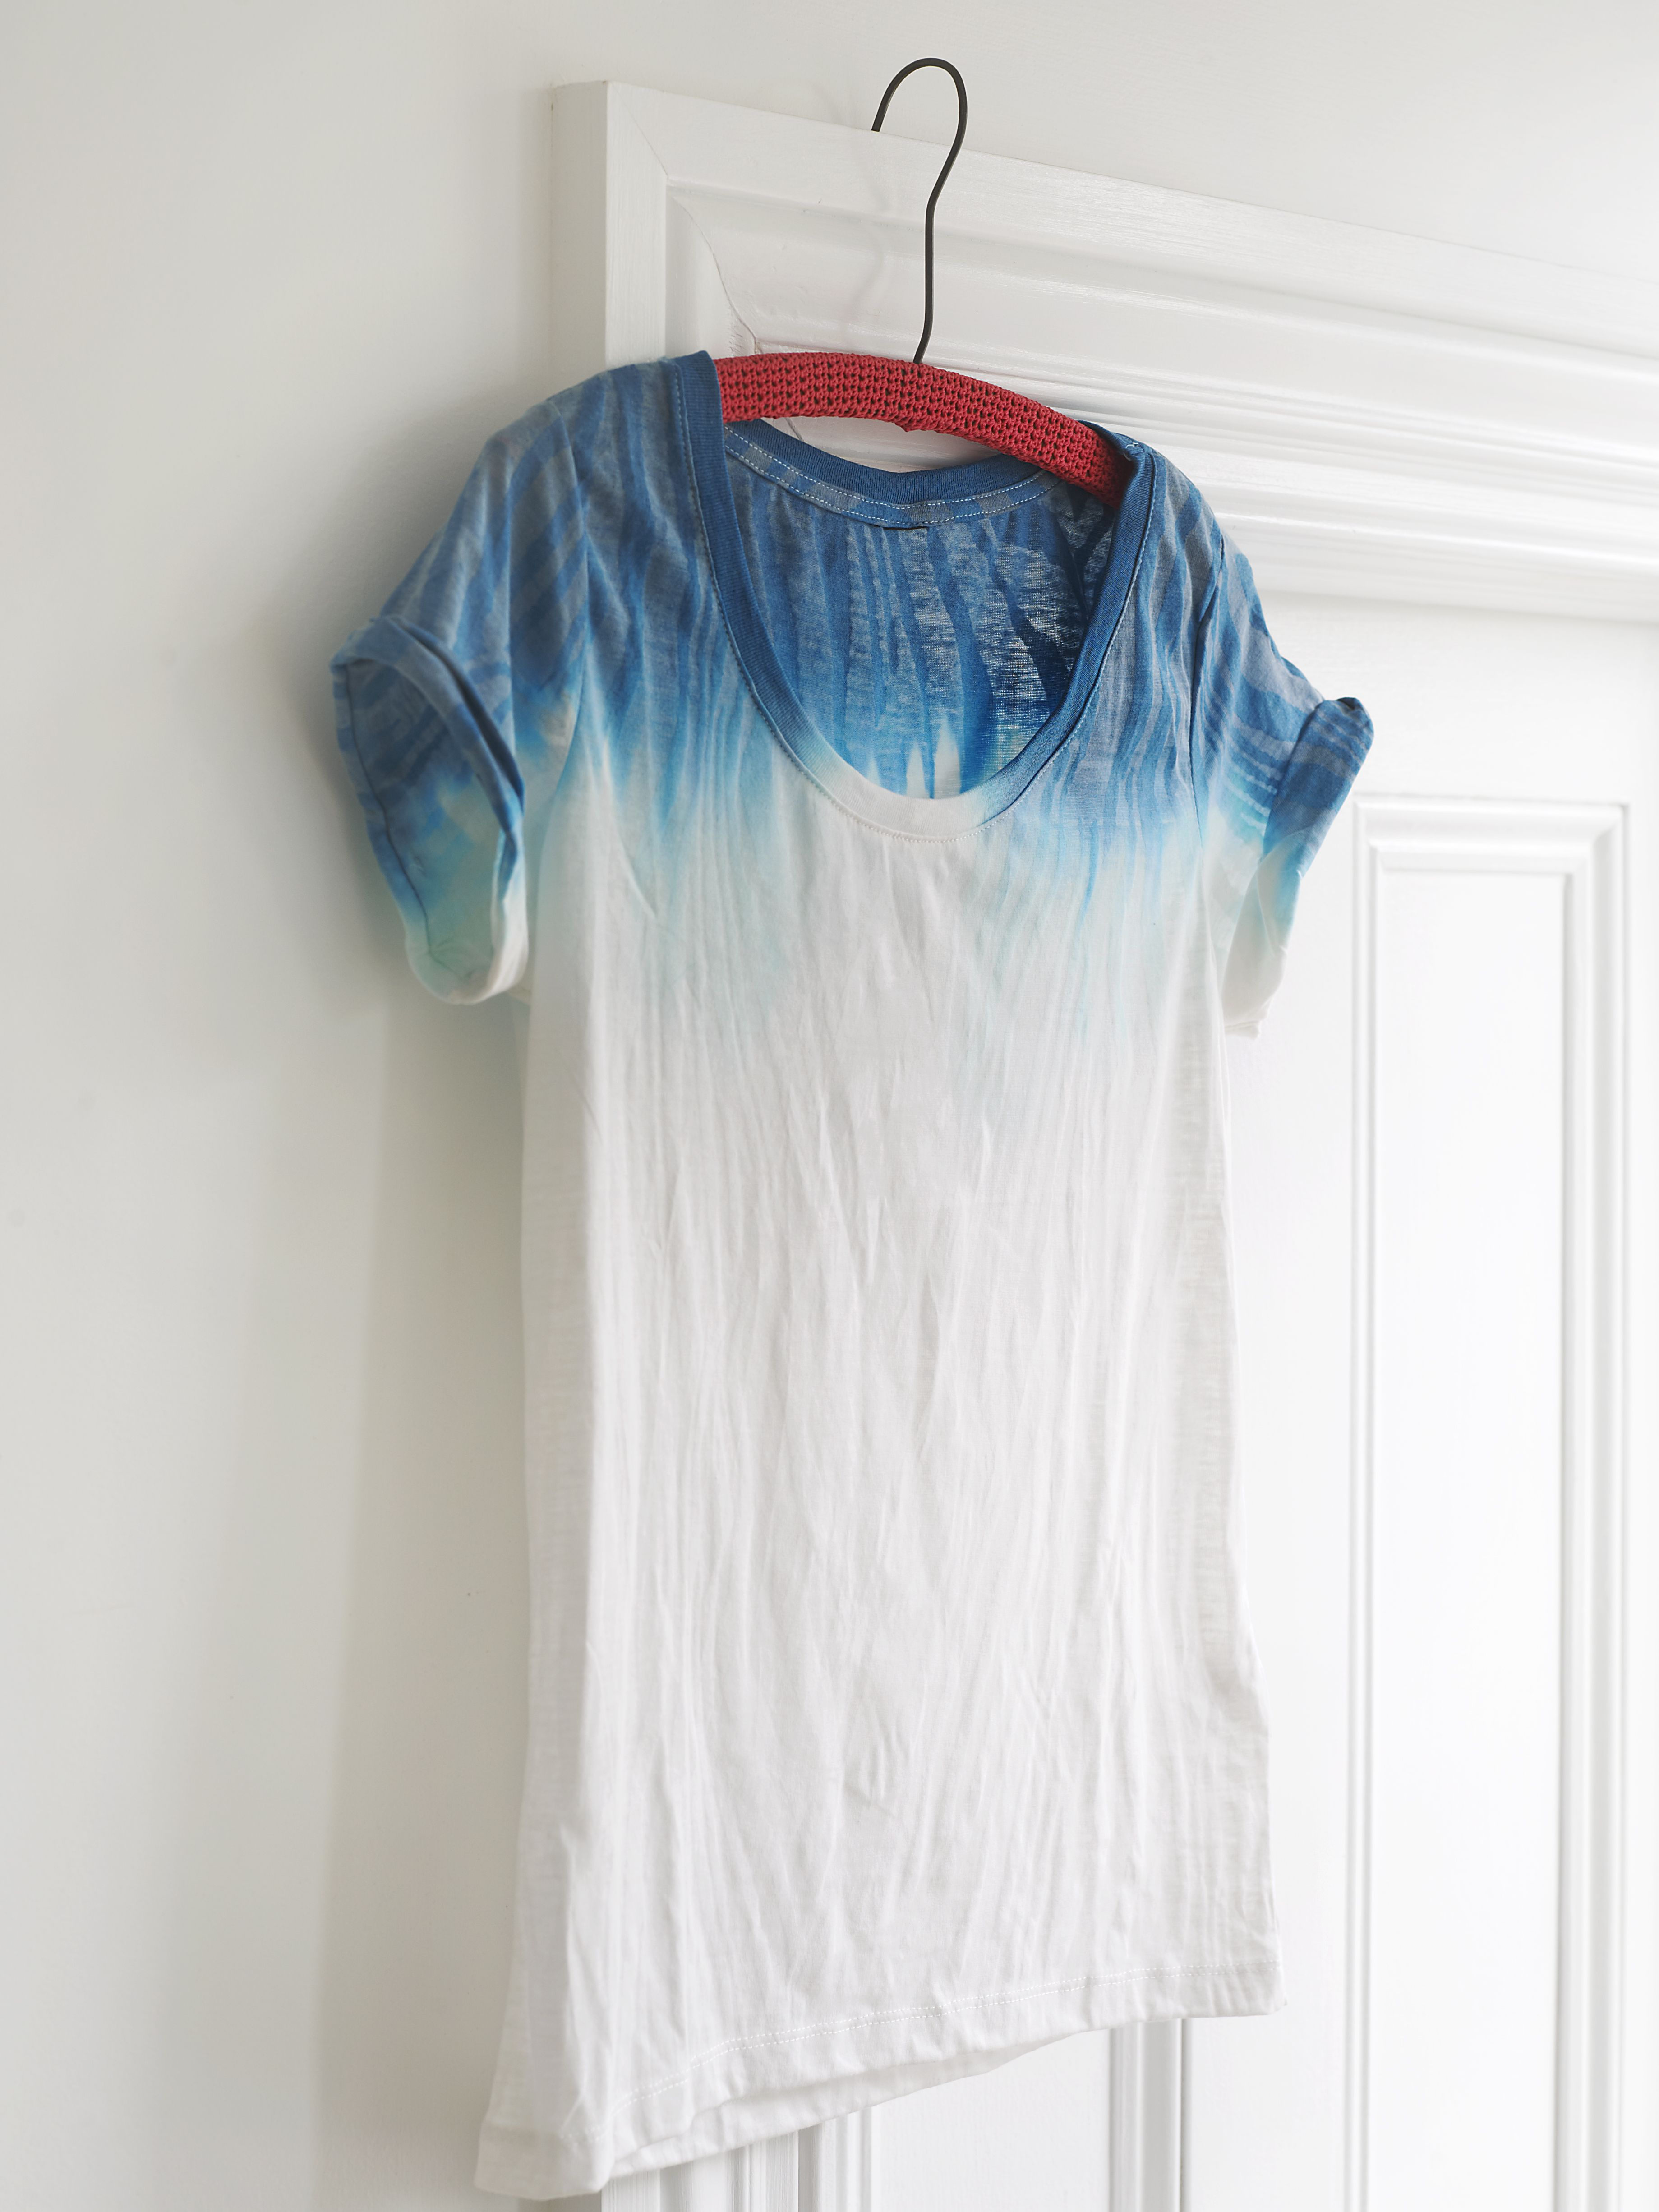 batik shirt wear to begin pinterest diy clothes diy and diy shirt. Black Bedroom Furniture Sets. Home Design Ideas